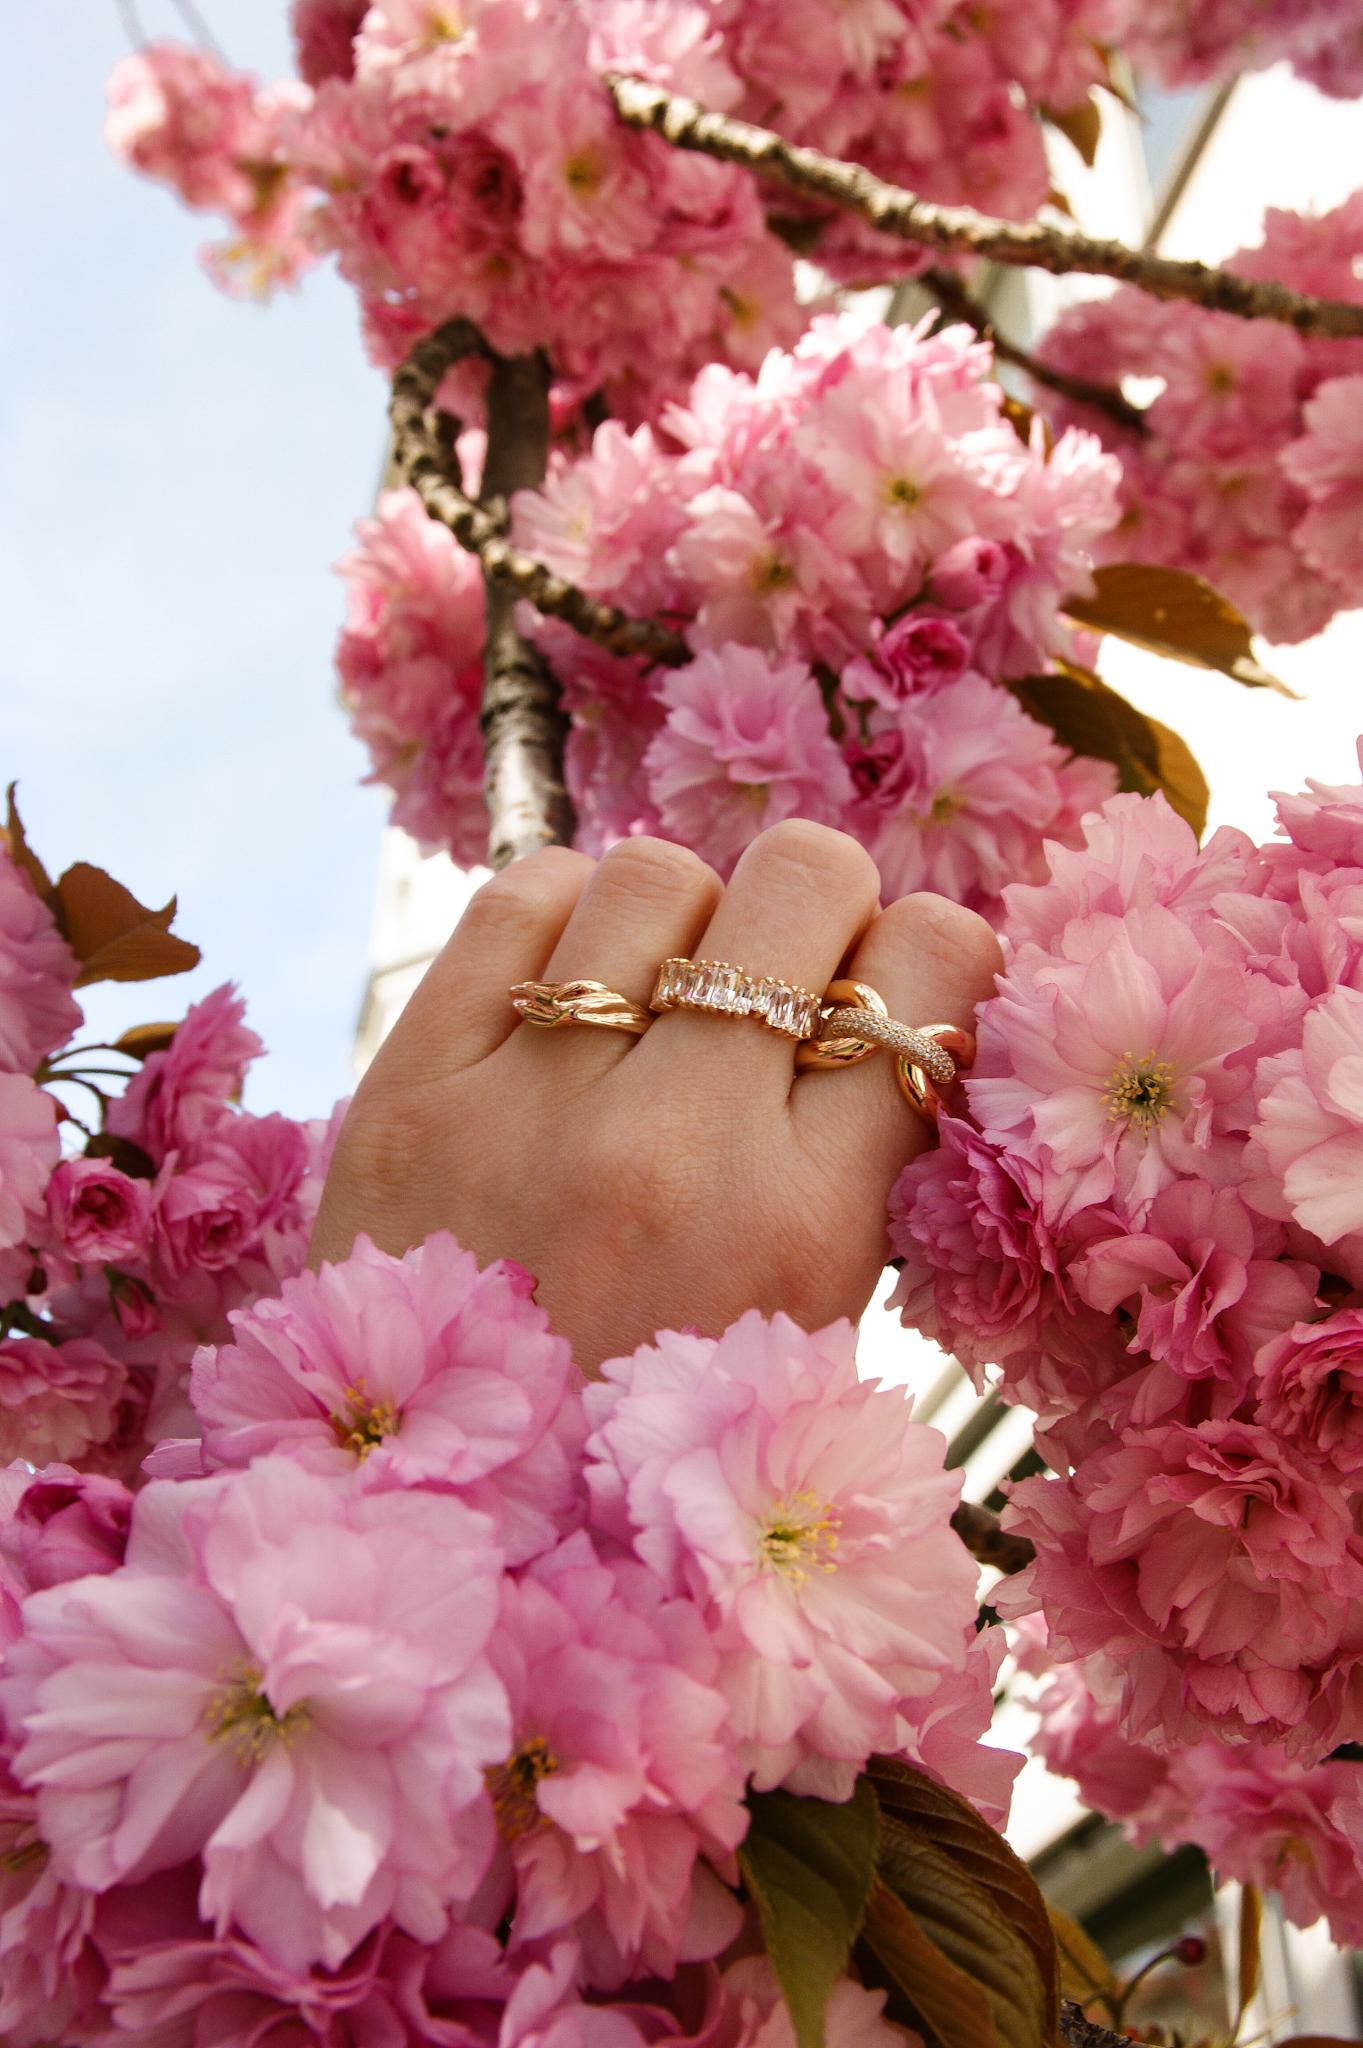 Sif Jakobs, Ringe, gold, statement, cherry blossom, Kirschblüten